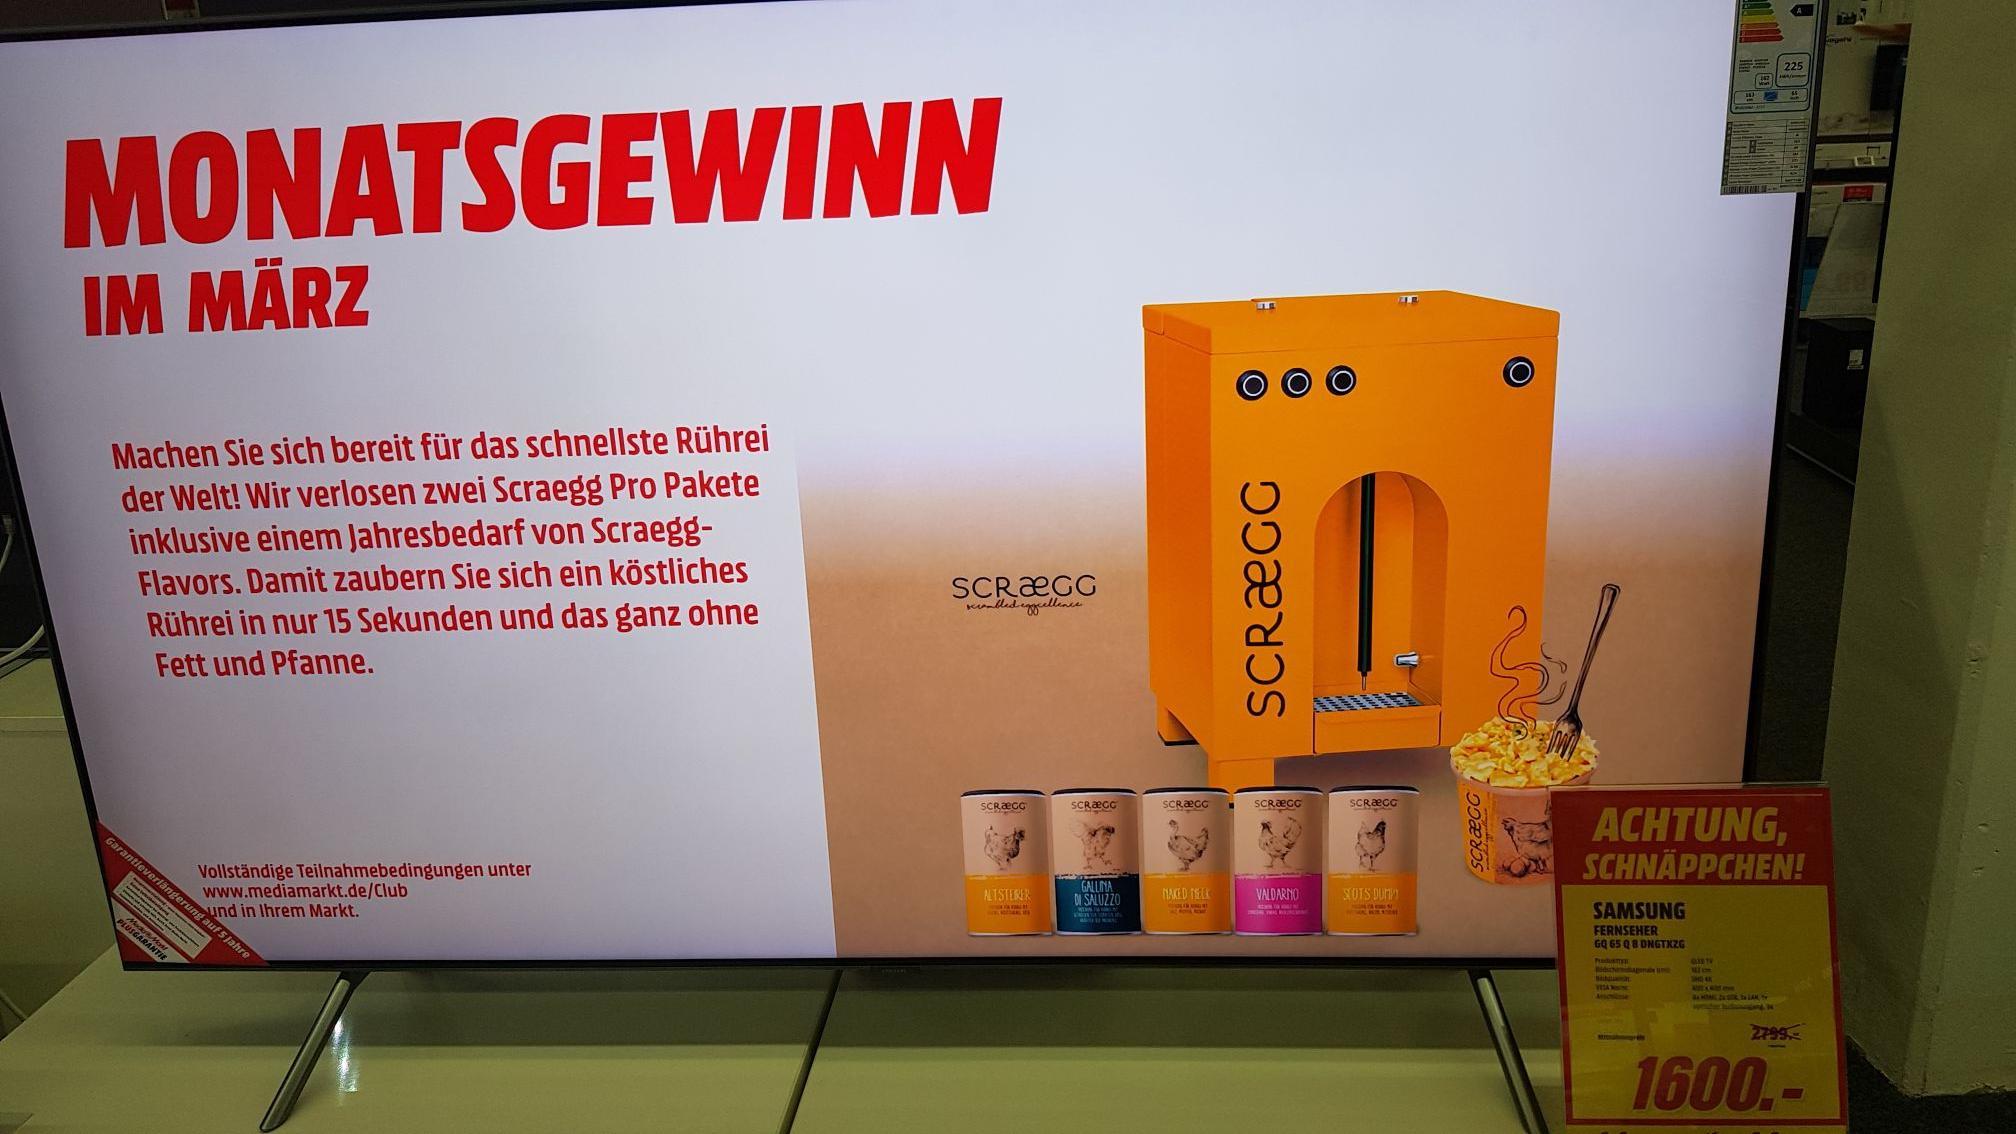 [ Lokal Media Markt Bochum Hofstede] SAMSUNG QLED FULL BACK LIGHT TV GQ65Q8D FÜR 1600€